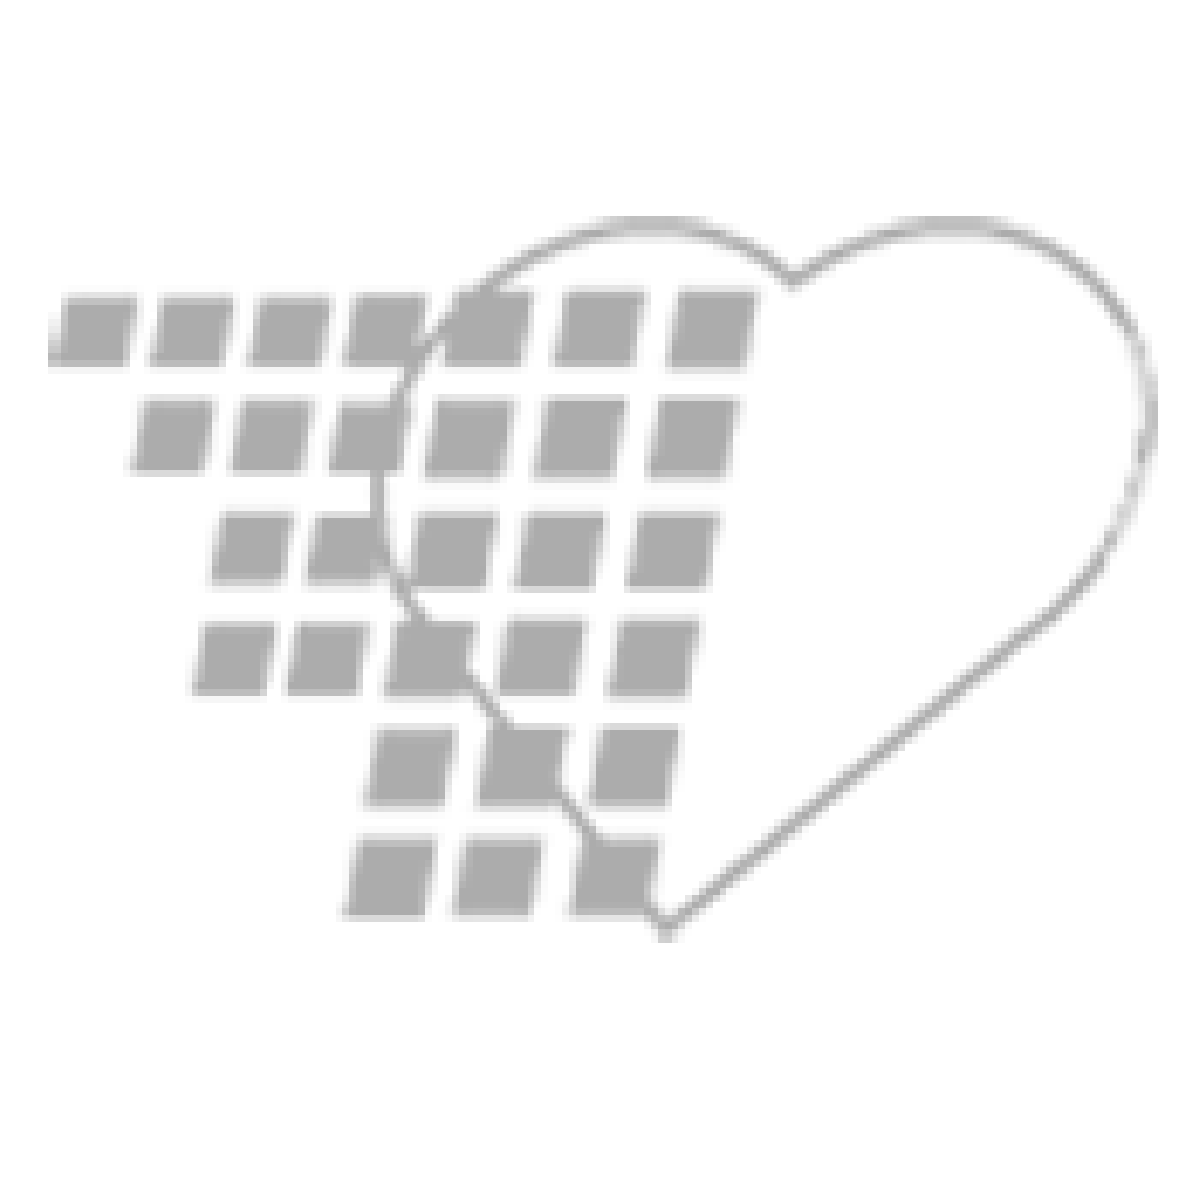 06-93-1153 - Demo Dose® Sodim Bicrb 8.4% 50mL